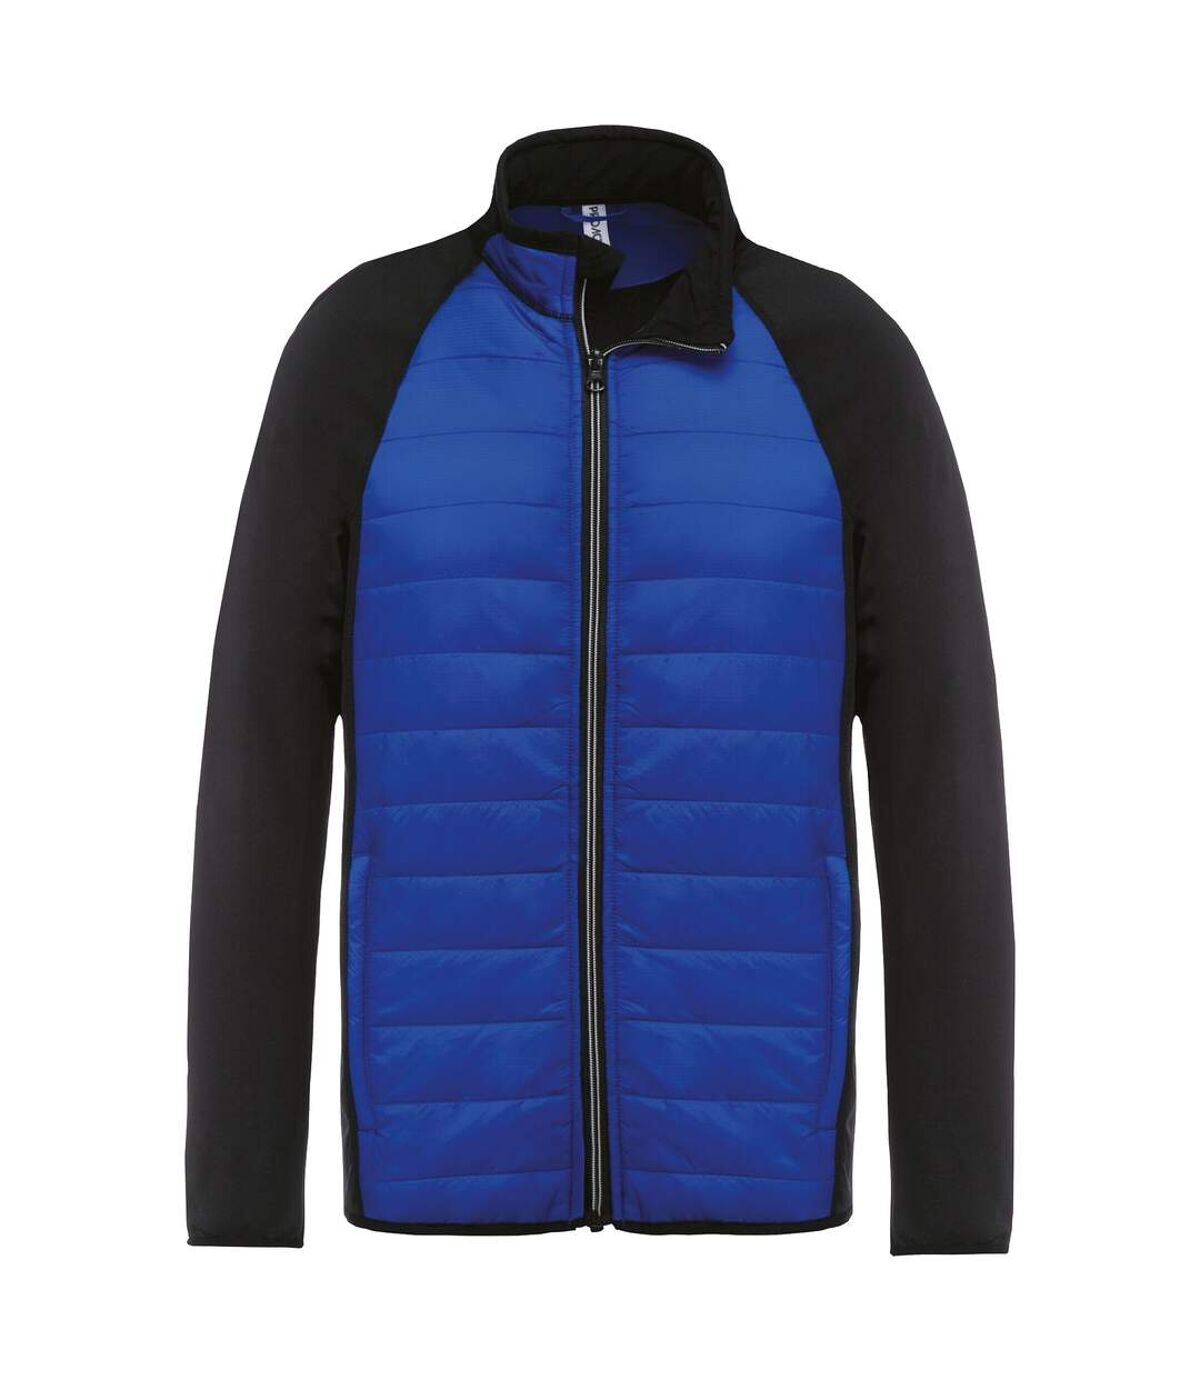 Kariban Proact Mens Dual Fabric Sports Jacket (Dark Royal/ Black) - UTRW6166